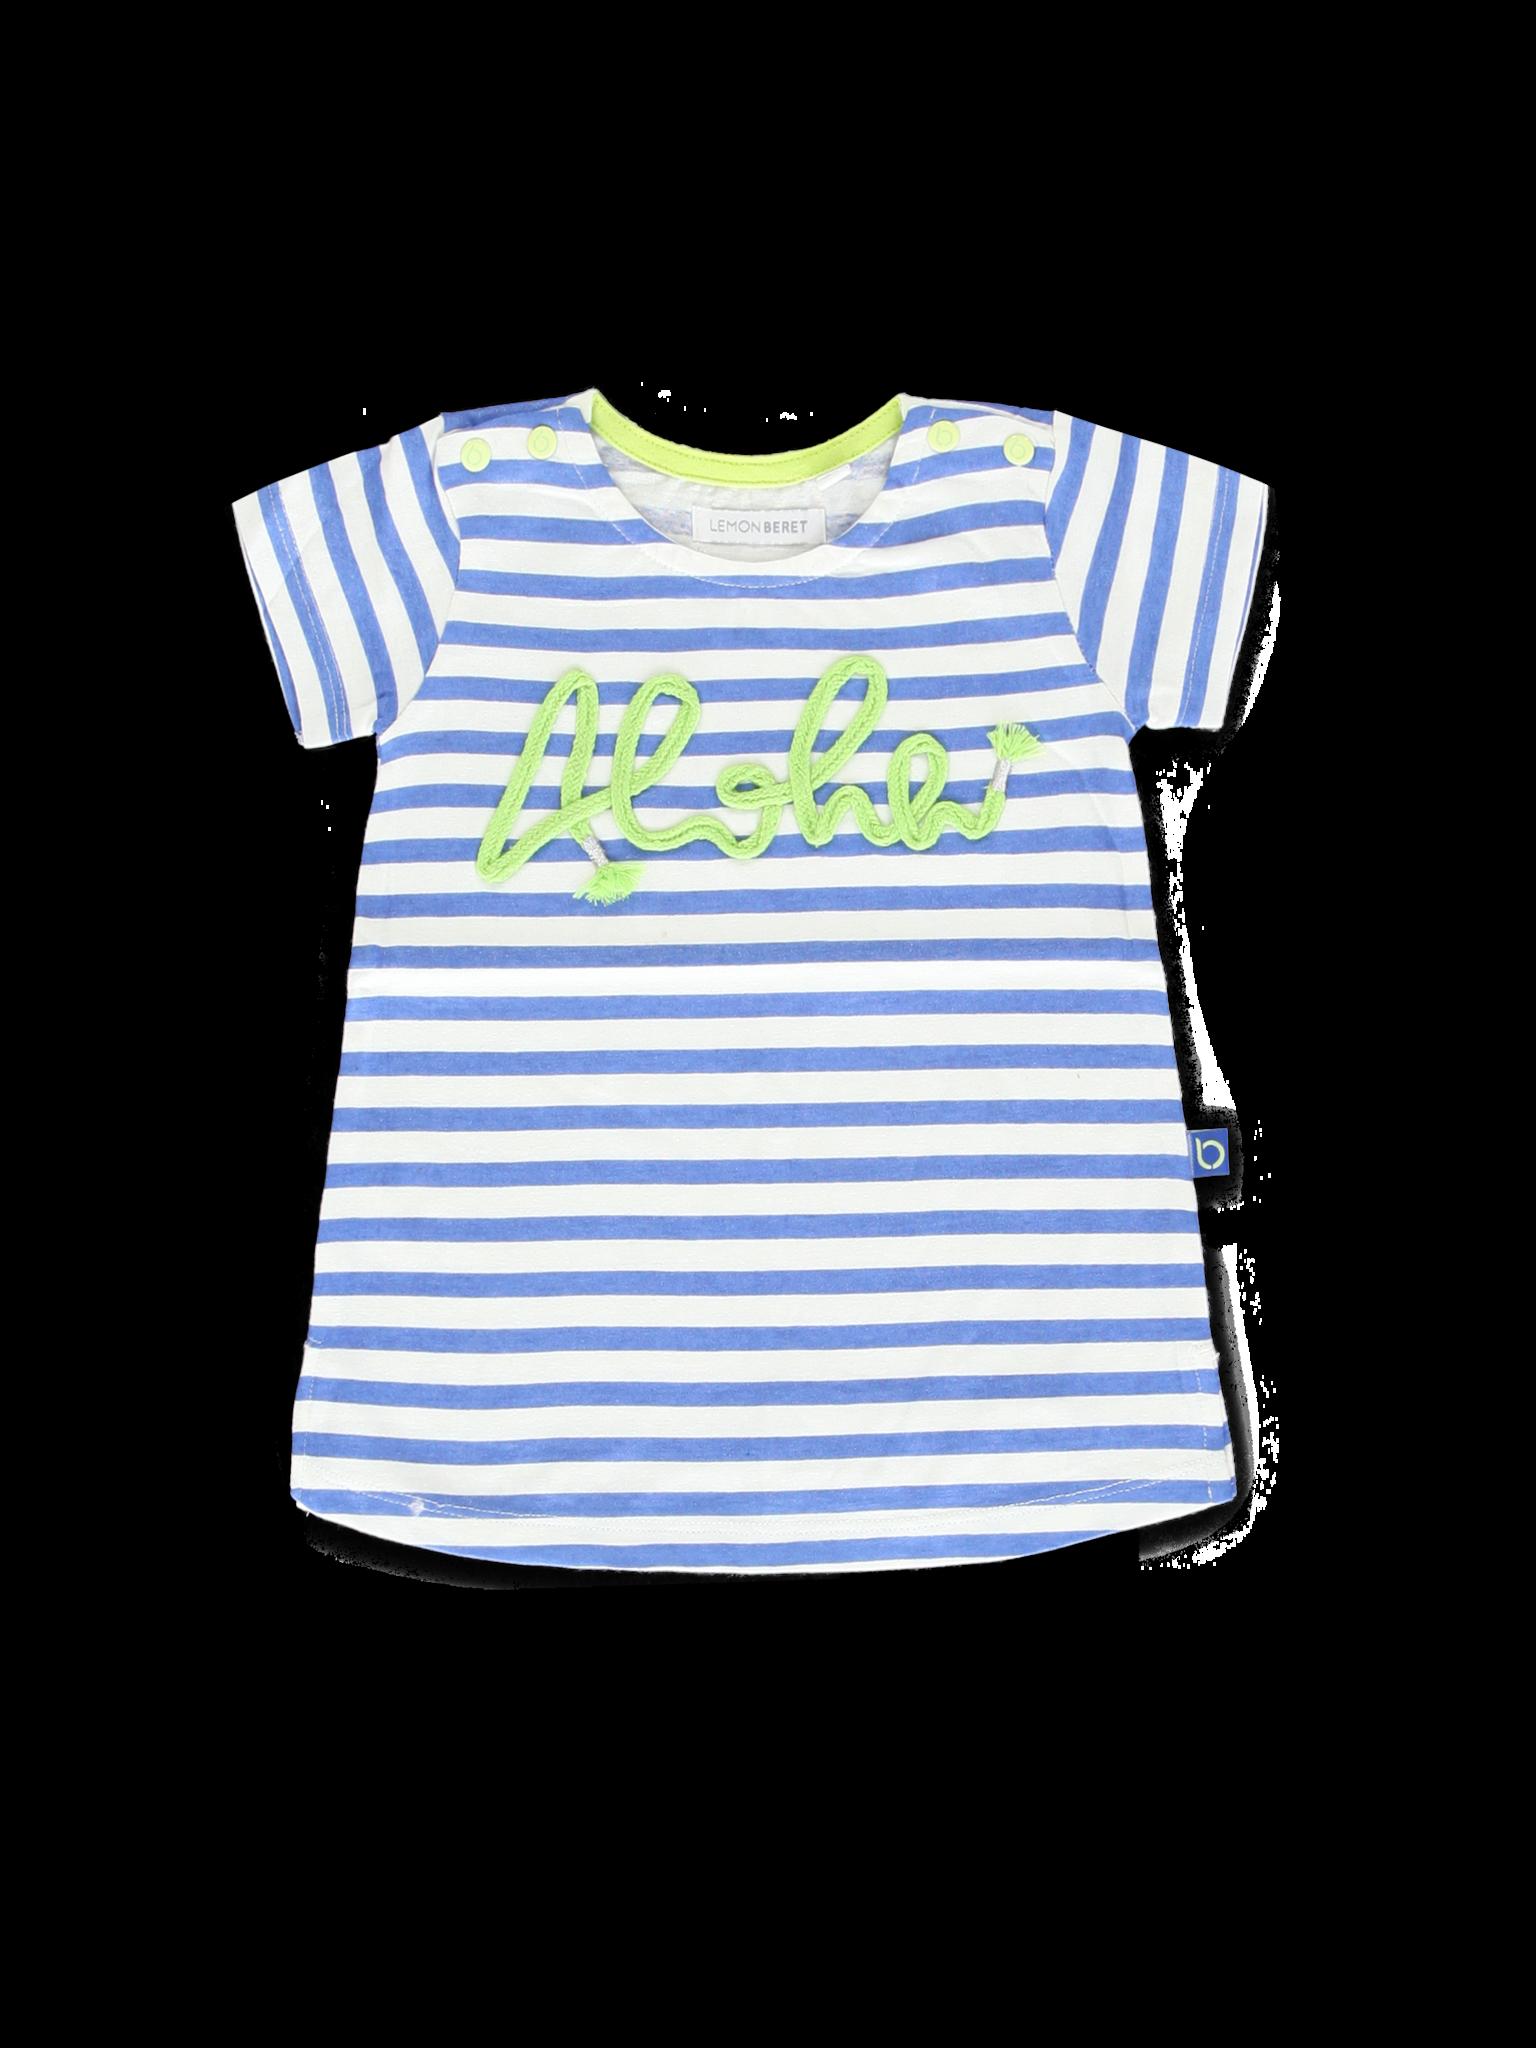 All Brands | Summerproducts Baby | Dress | 8 pcs/box